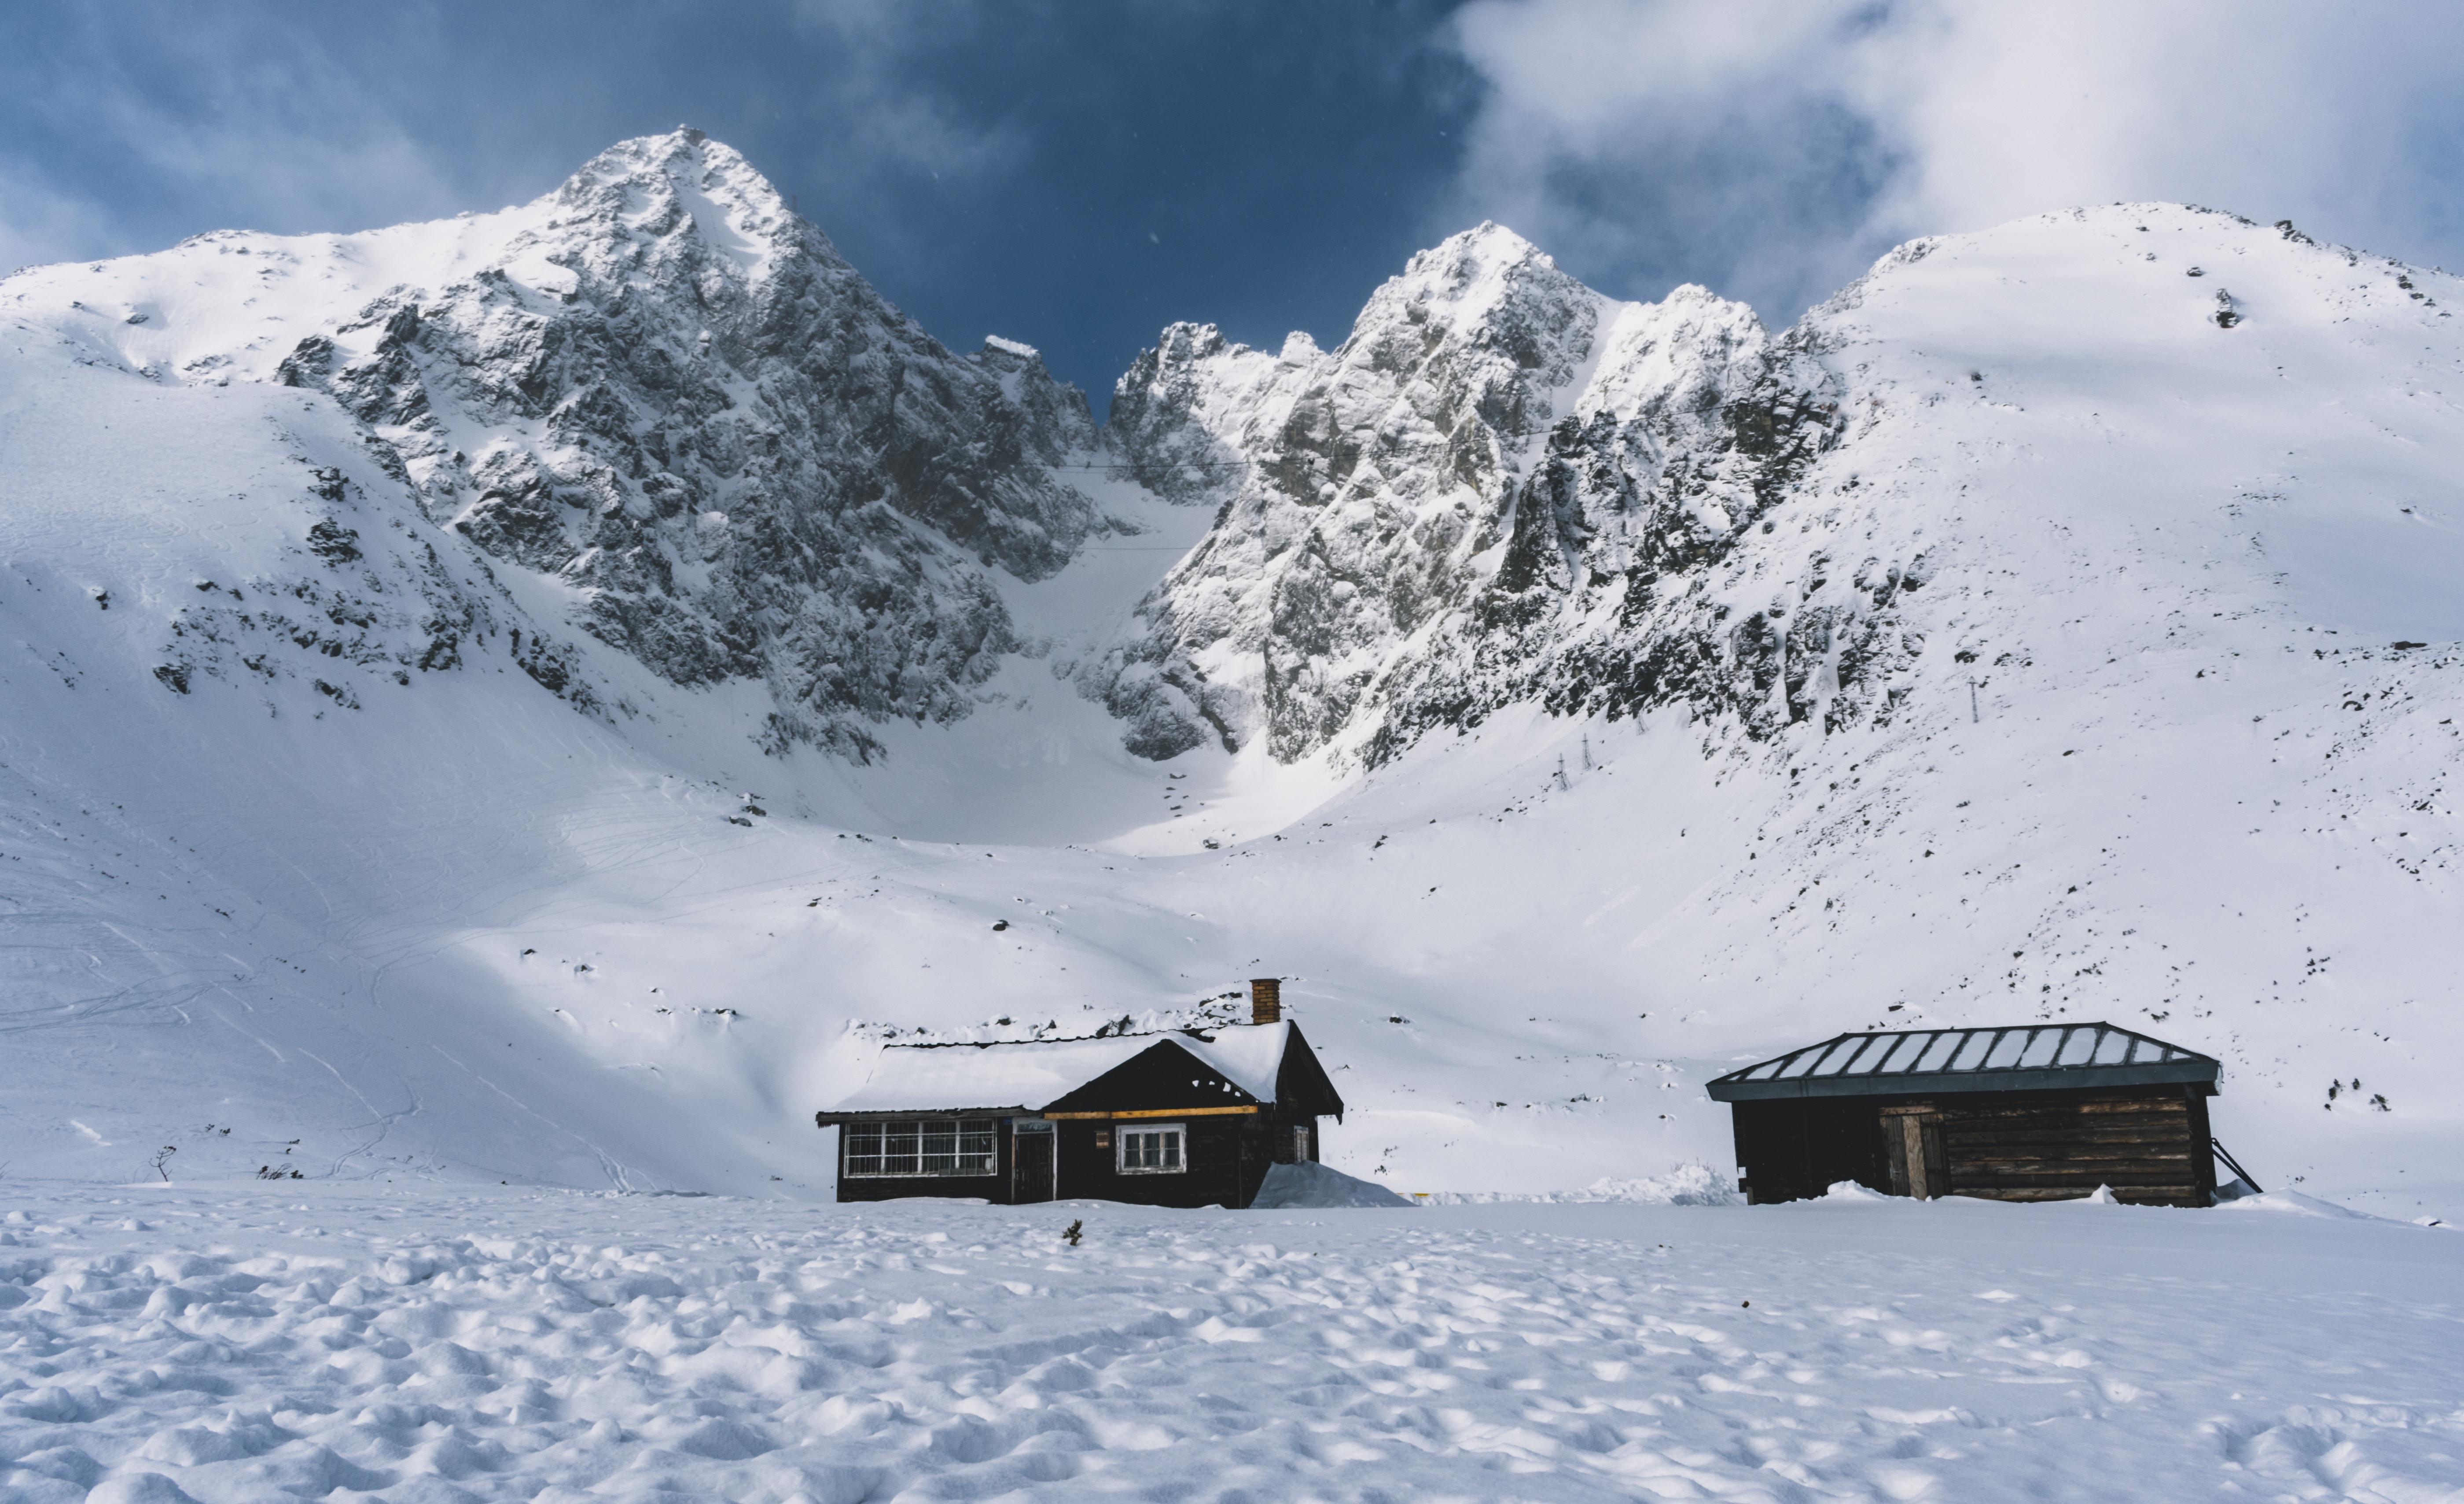 photo of house near snowy mountain